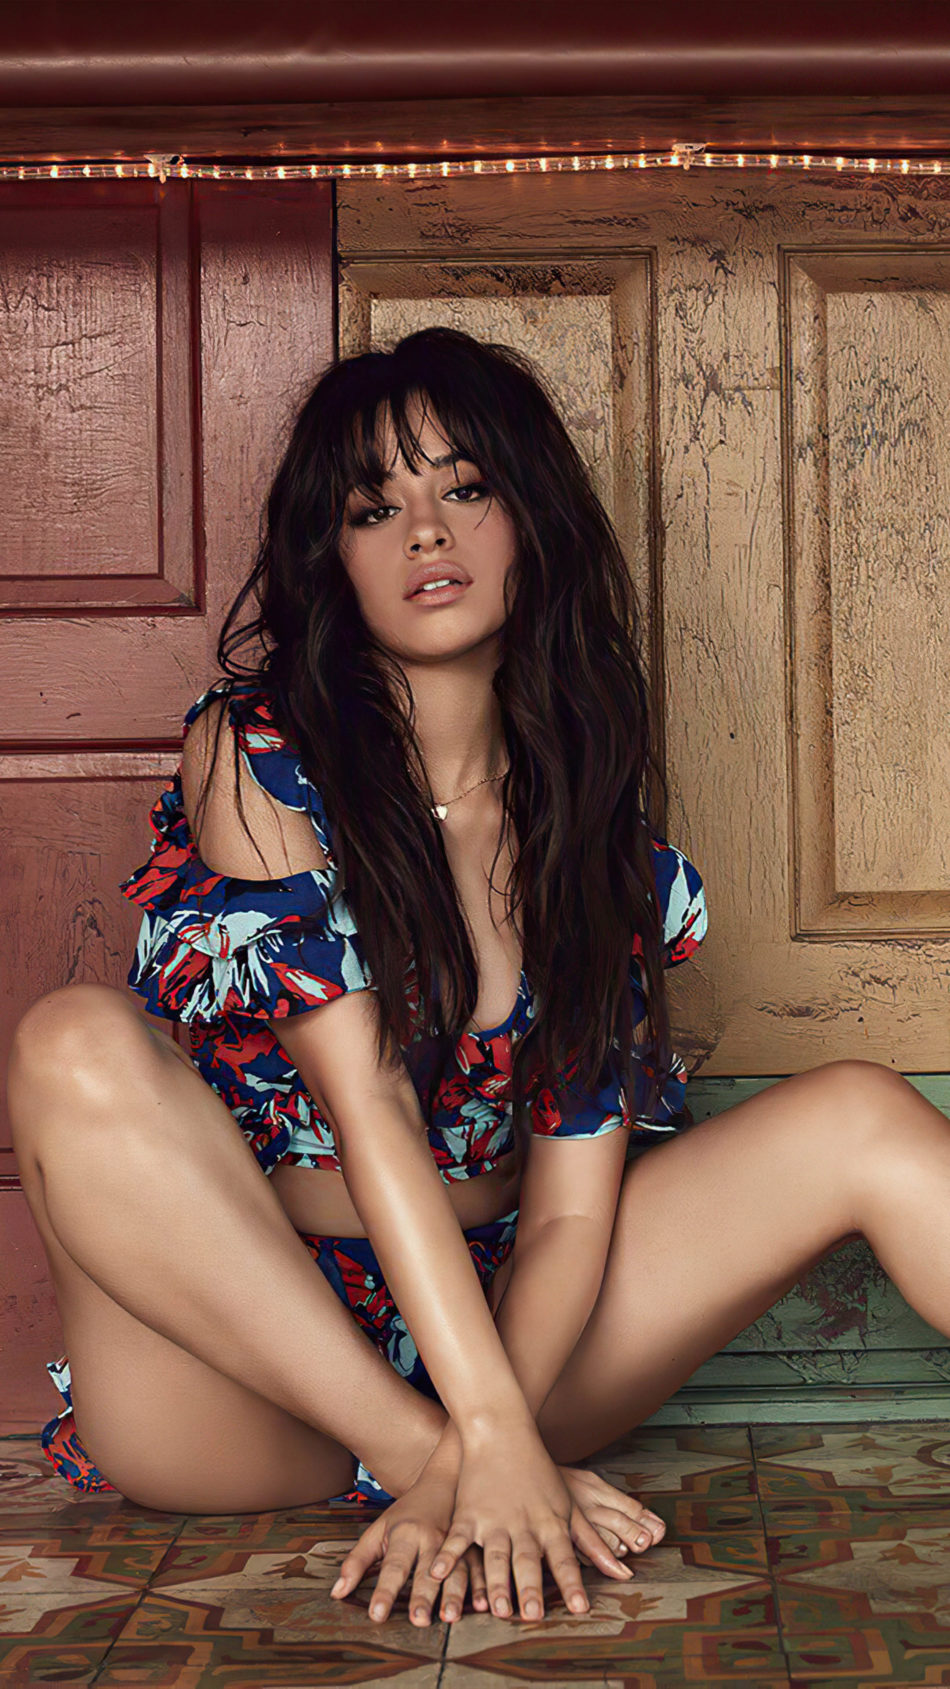 Singer Camila Cabello 2020 4K Ultra HD Mobile Wallpaper